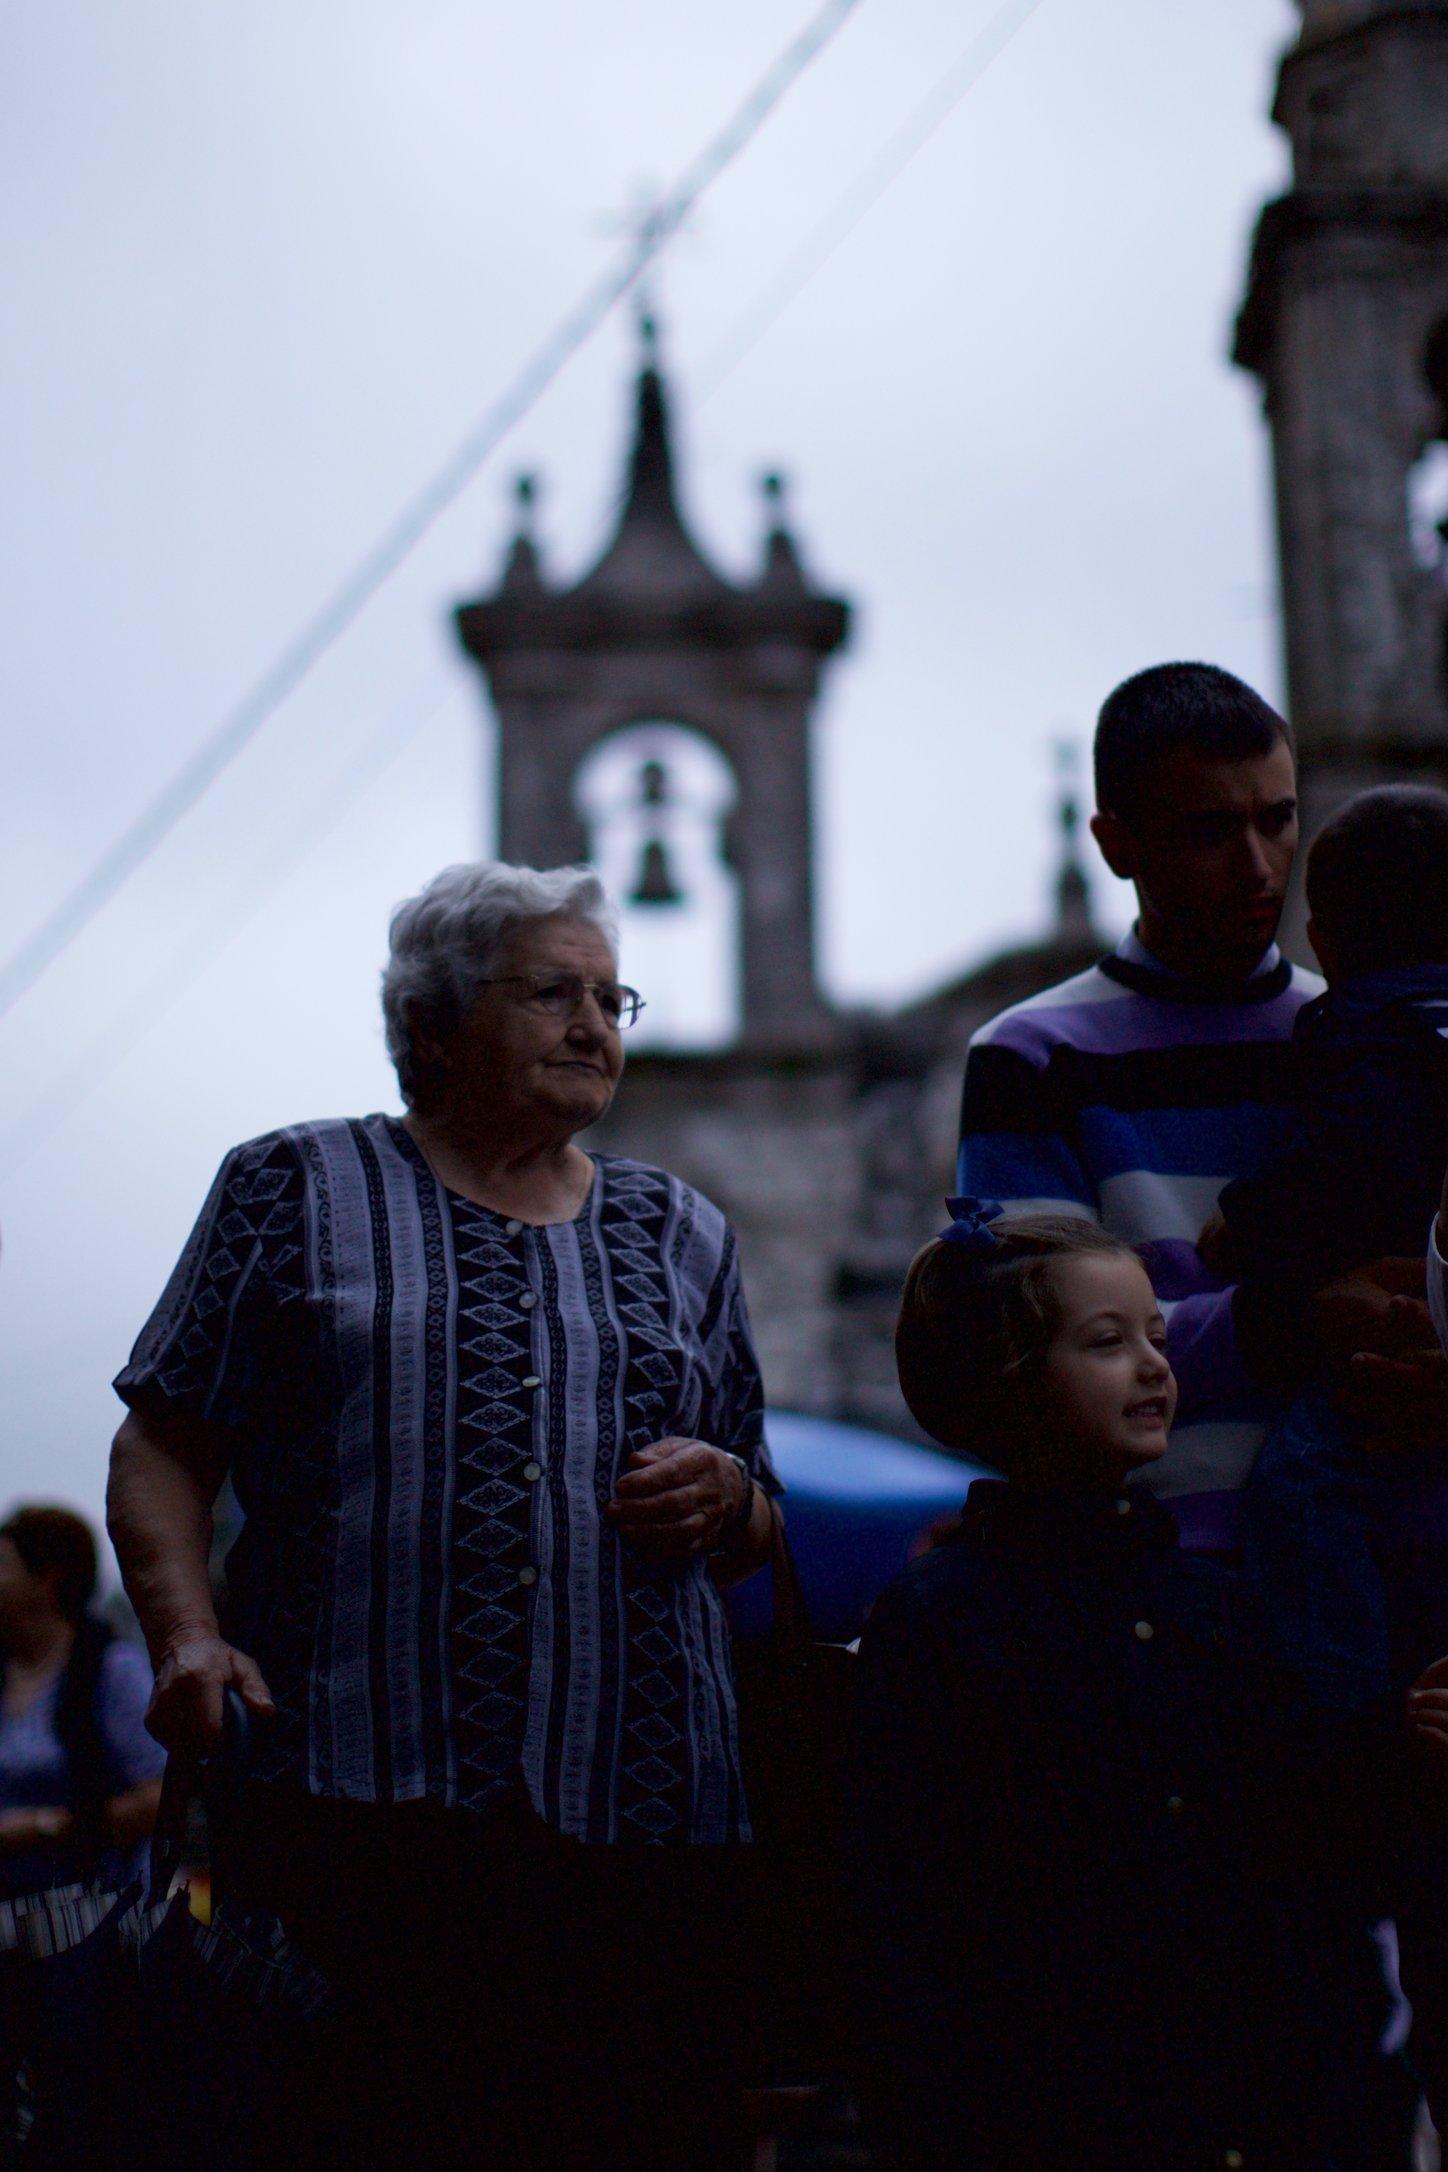 Galicia_016.jpg